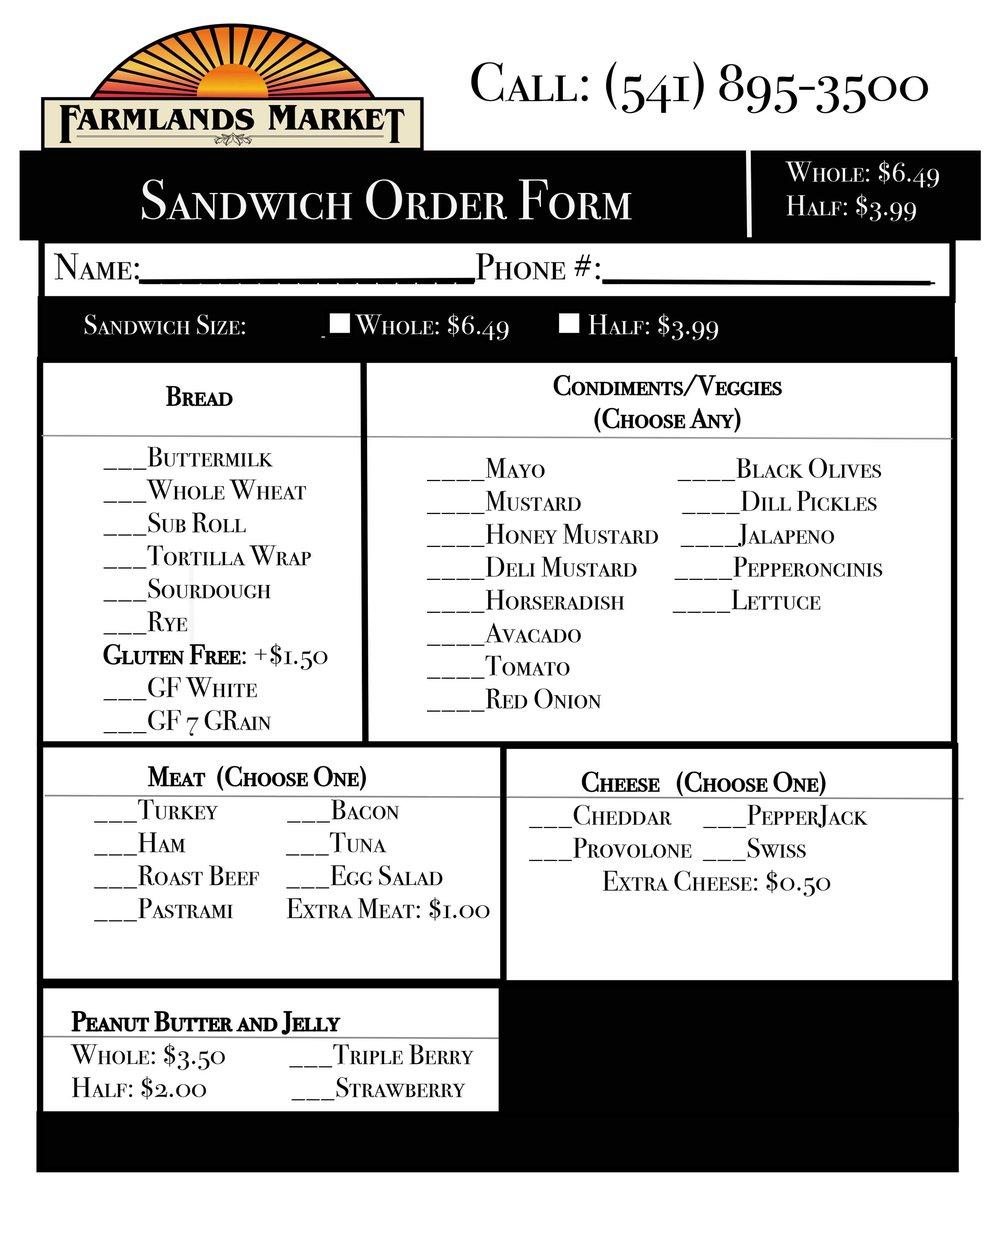 Sandwich Order Form.jpg